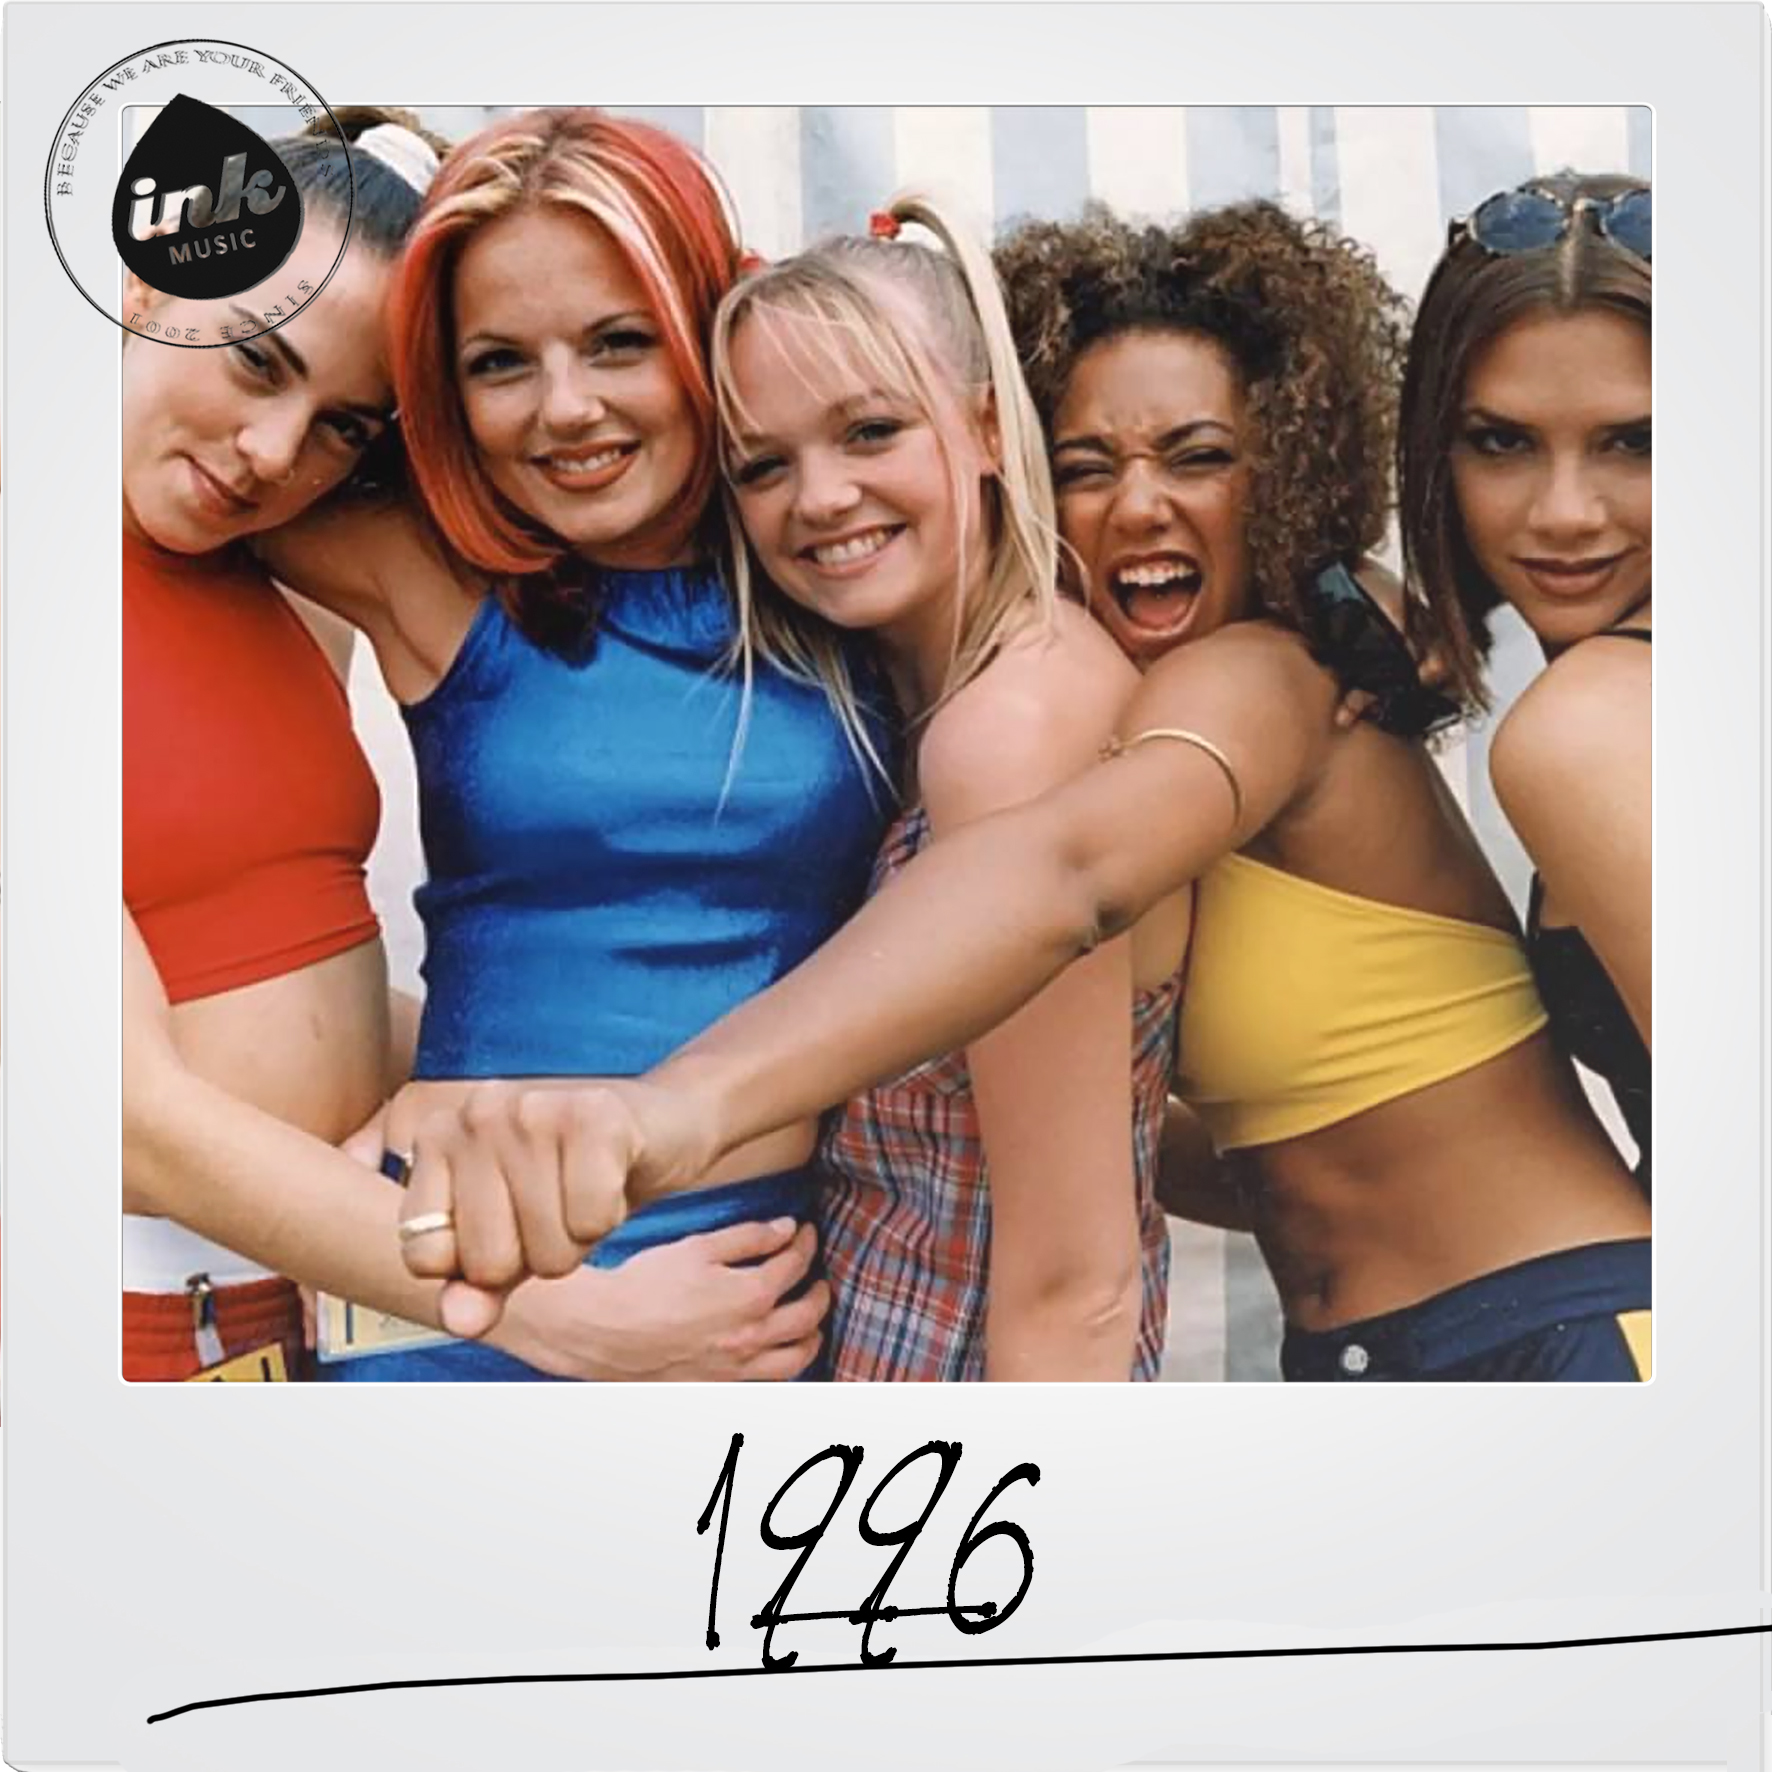 polaroid_spotify_yearlist-1996